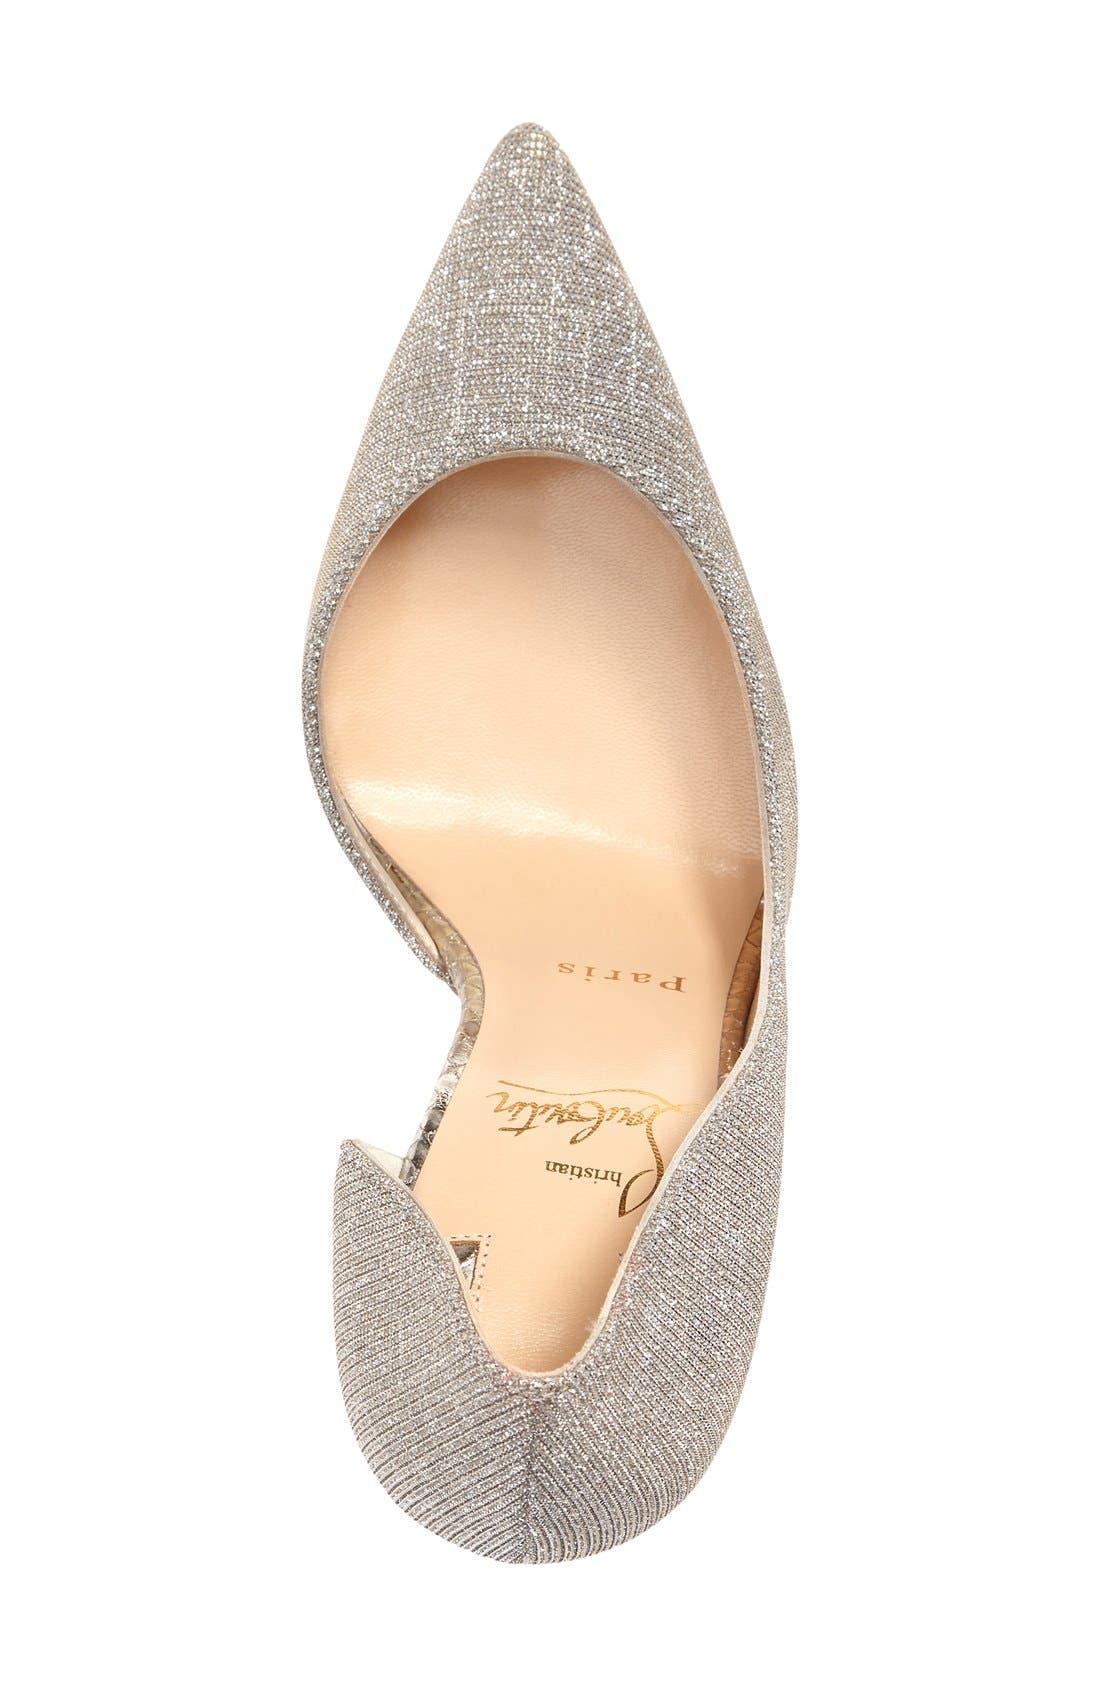 'Iriza' Half d'Orsay Glitter Pump,                             Alternate thumbnail 3, color,                             Metallic Silver